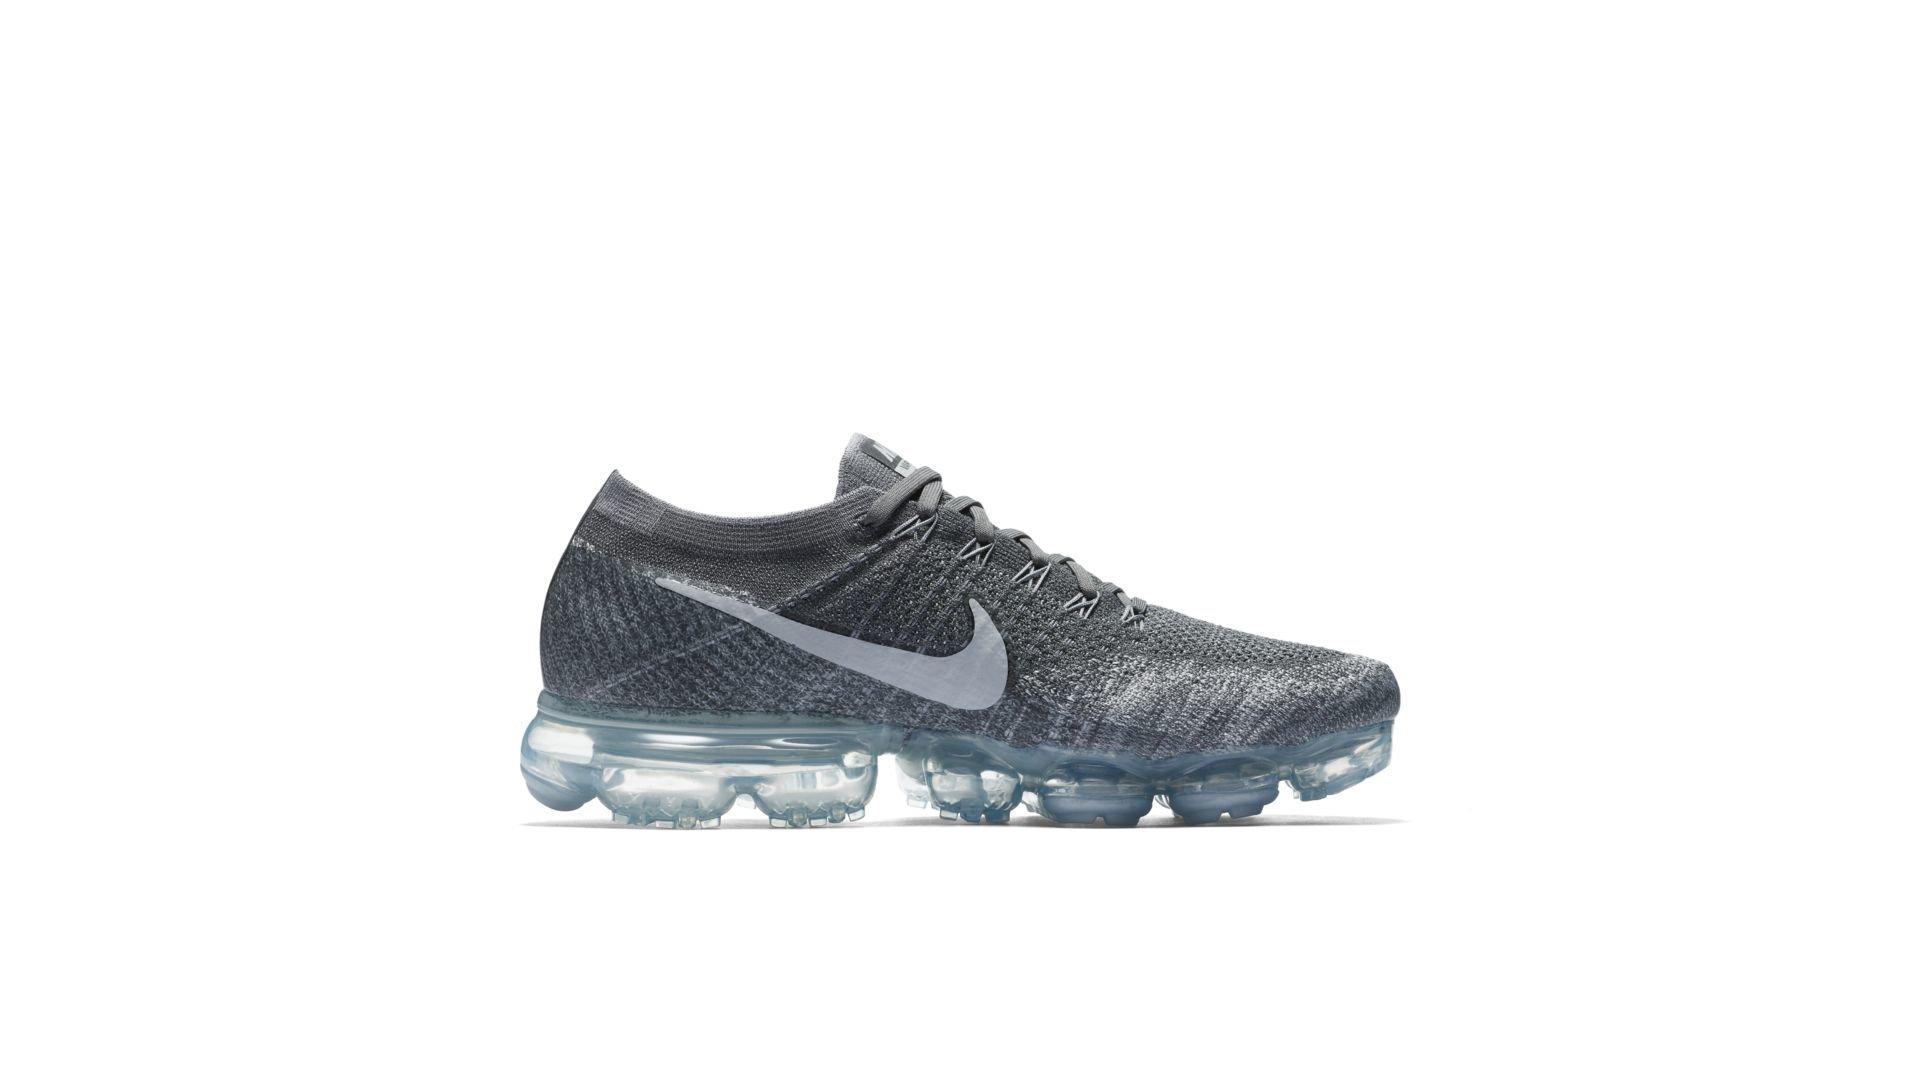 Nike VaporMax Dark Grey (849558-002)